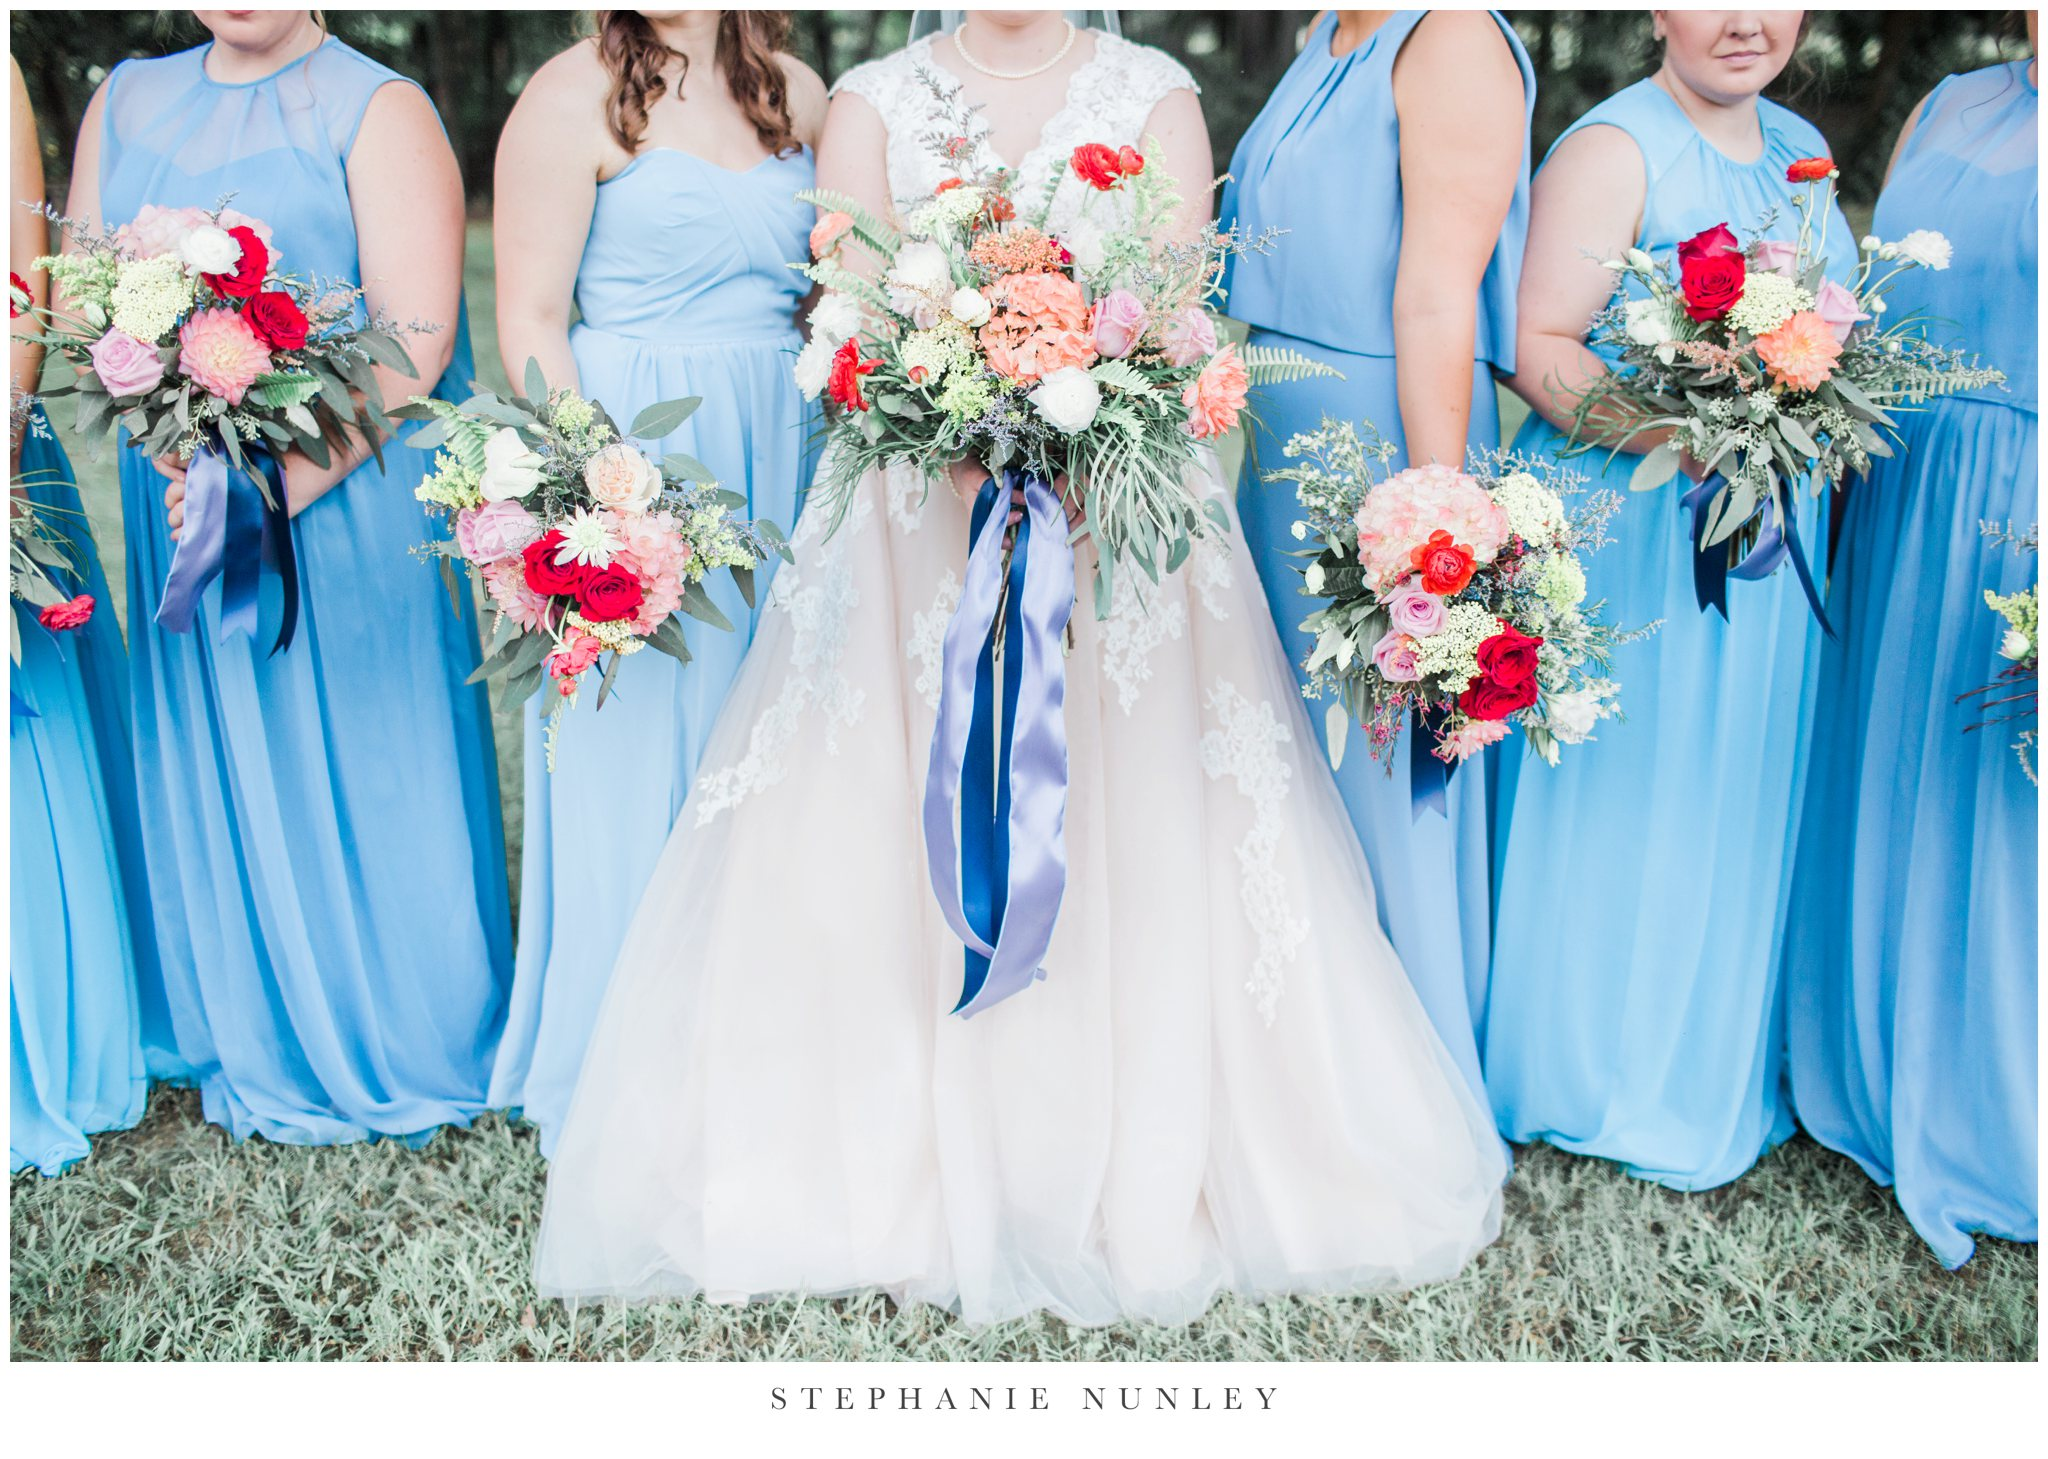 arkansas-wedding-with-lush-wildflower-bouquet-0070.jpg